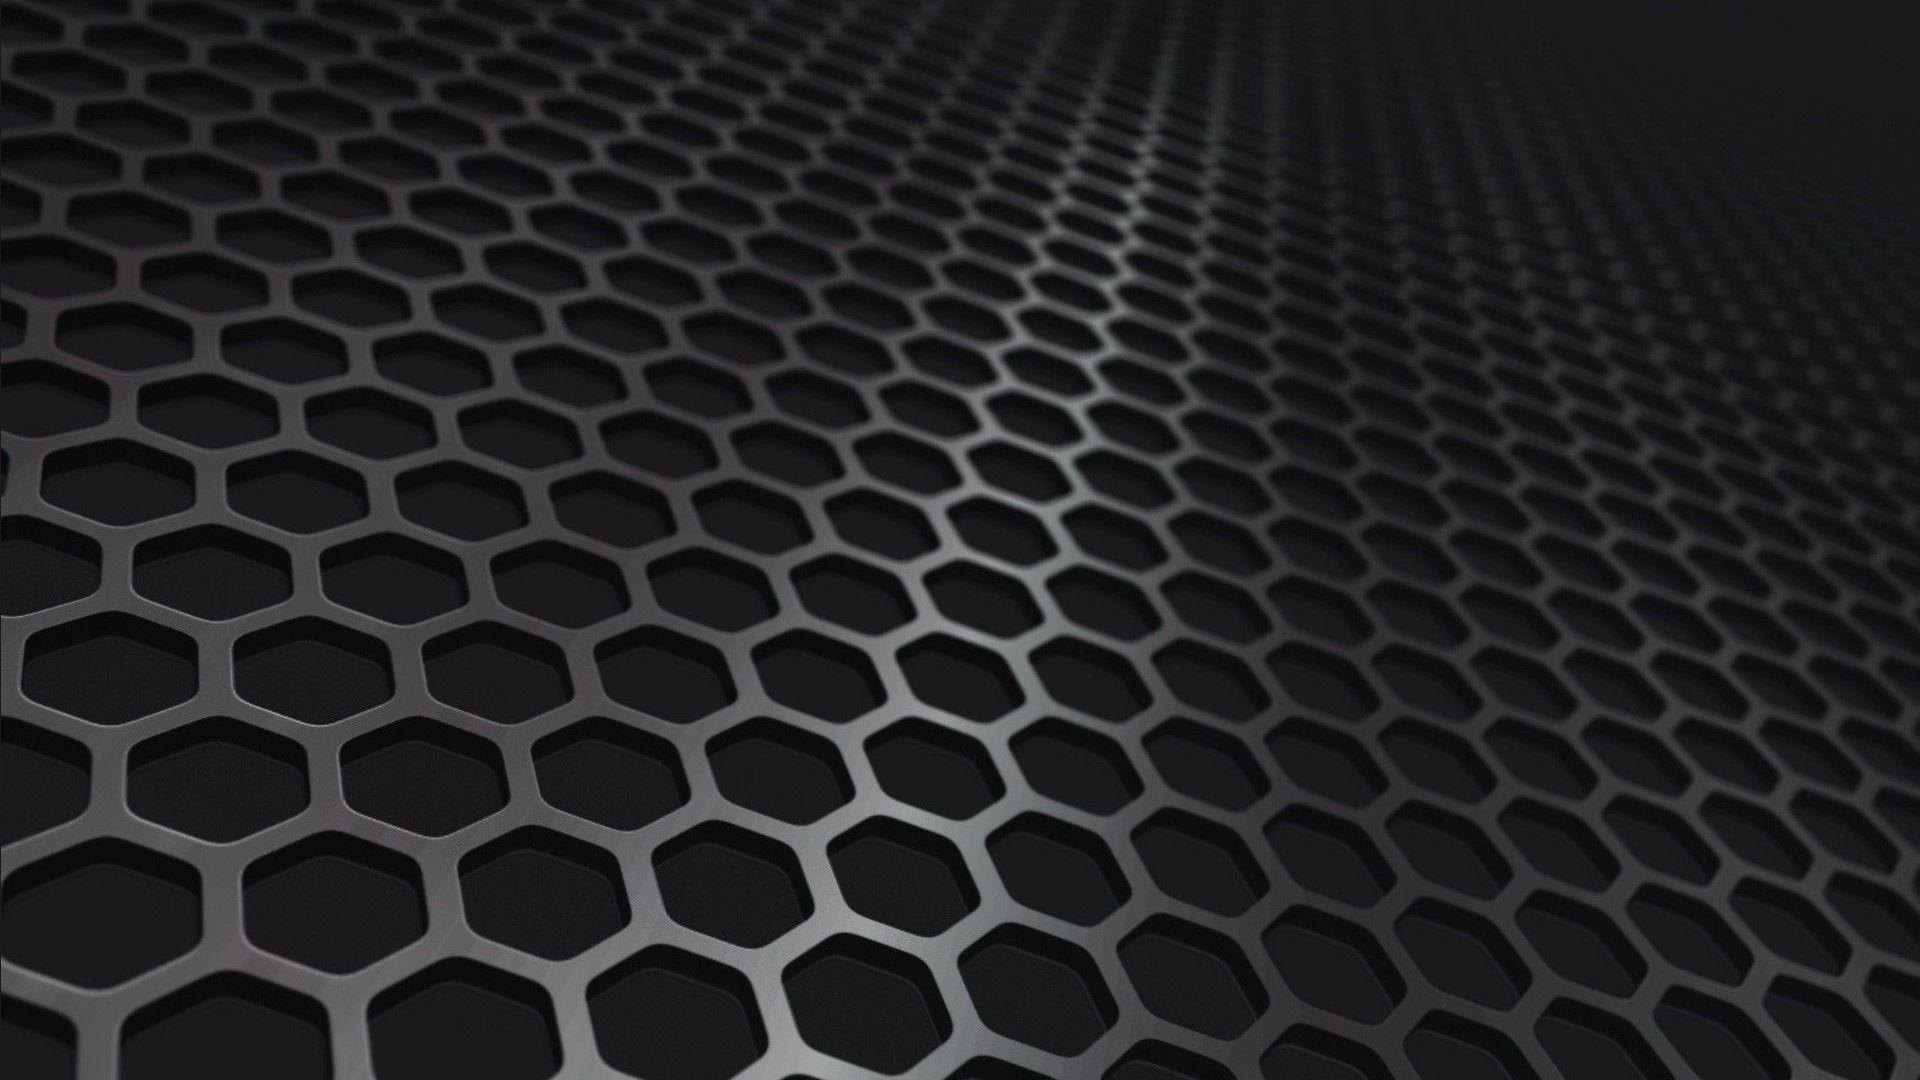 [44+] Black Honeycomb Wallpaper On WallpaperSafari